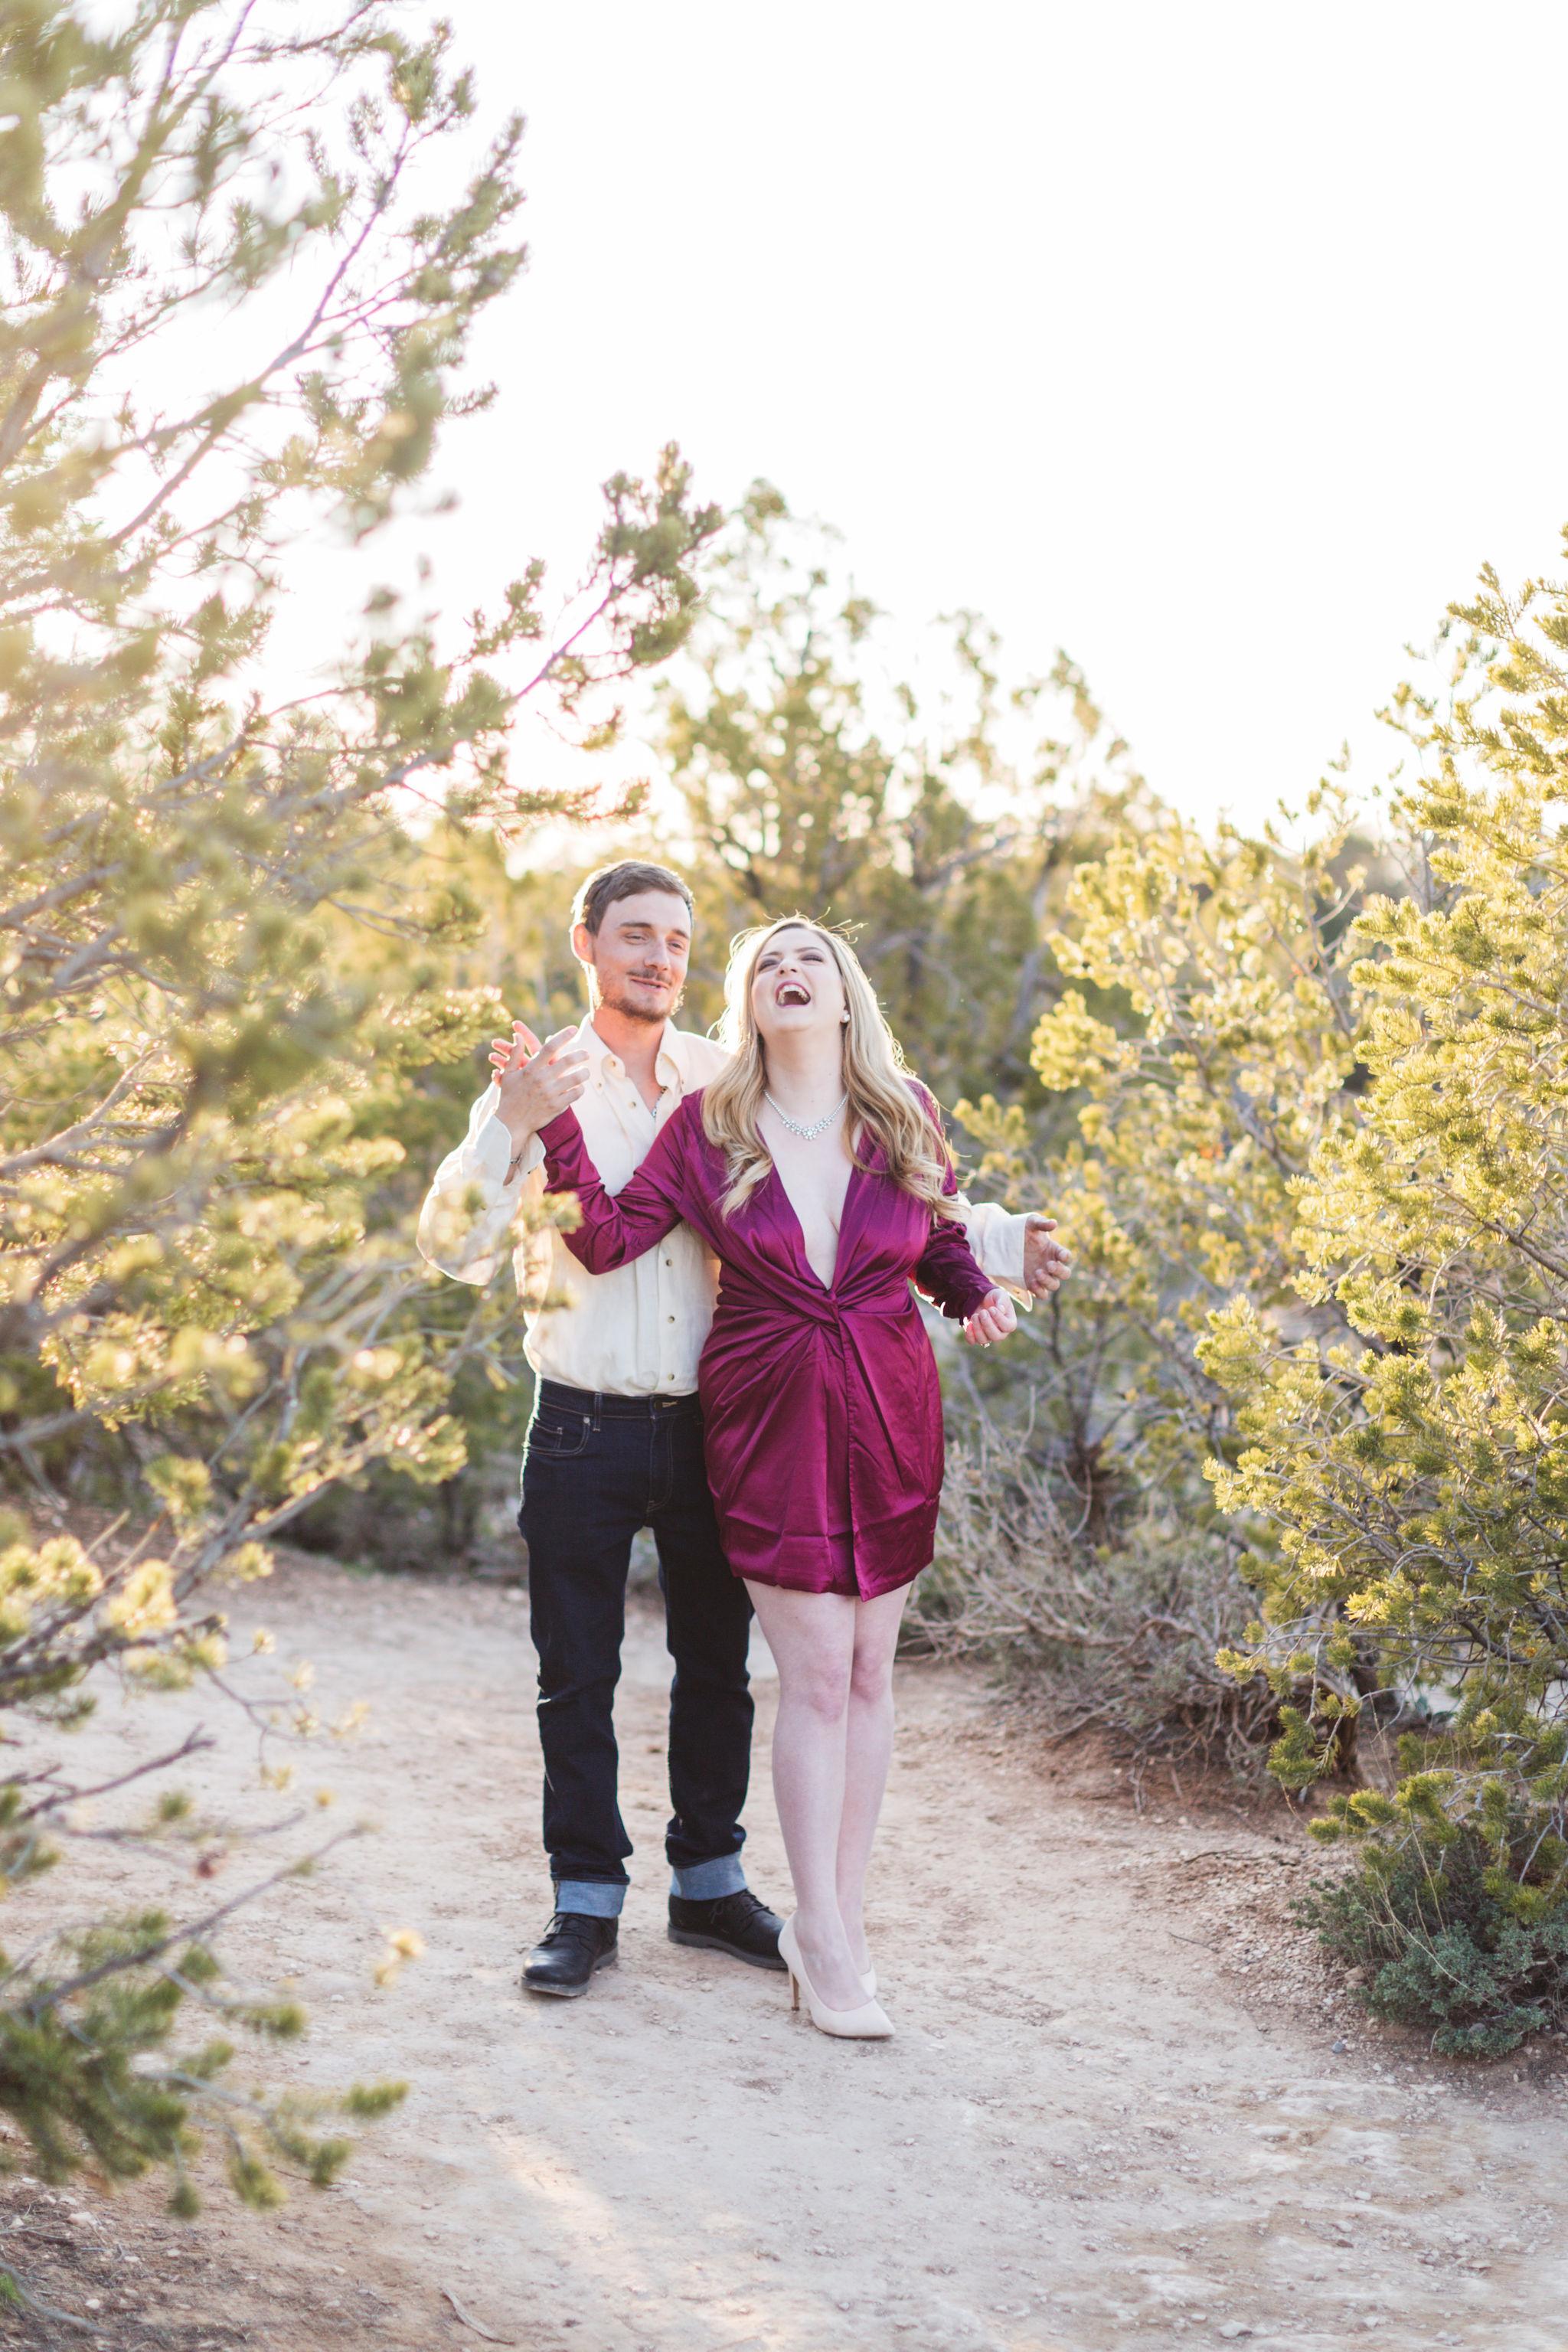 Christiana-David–Engagement-Zoe-Larkin-Photography-35